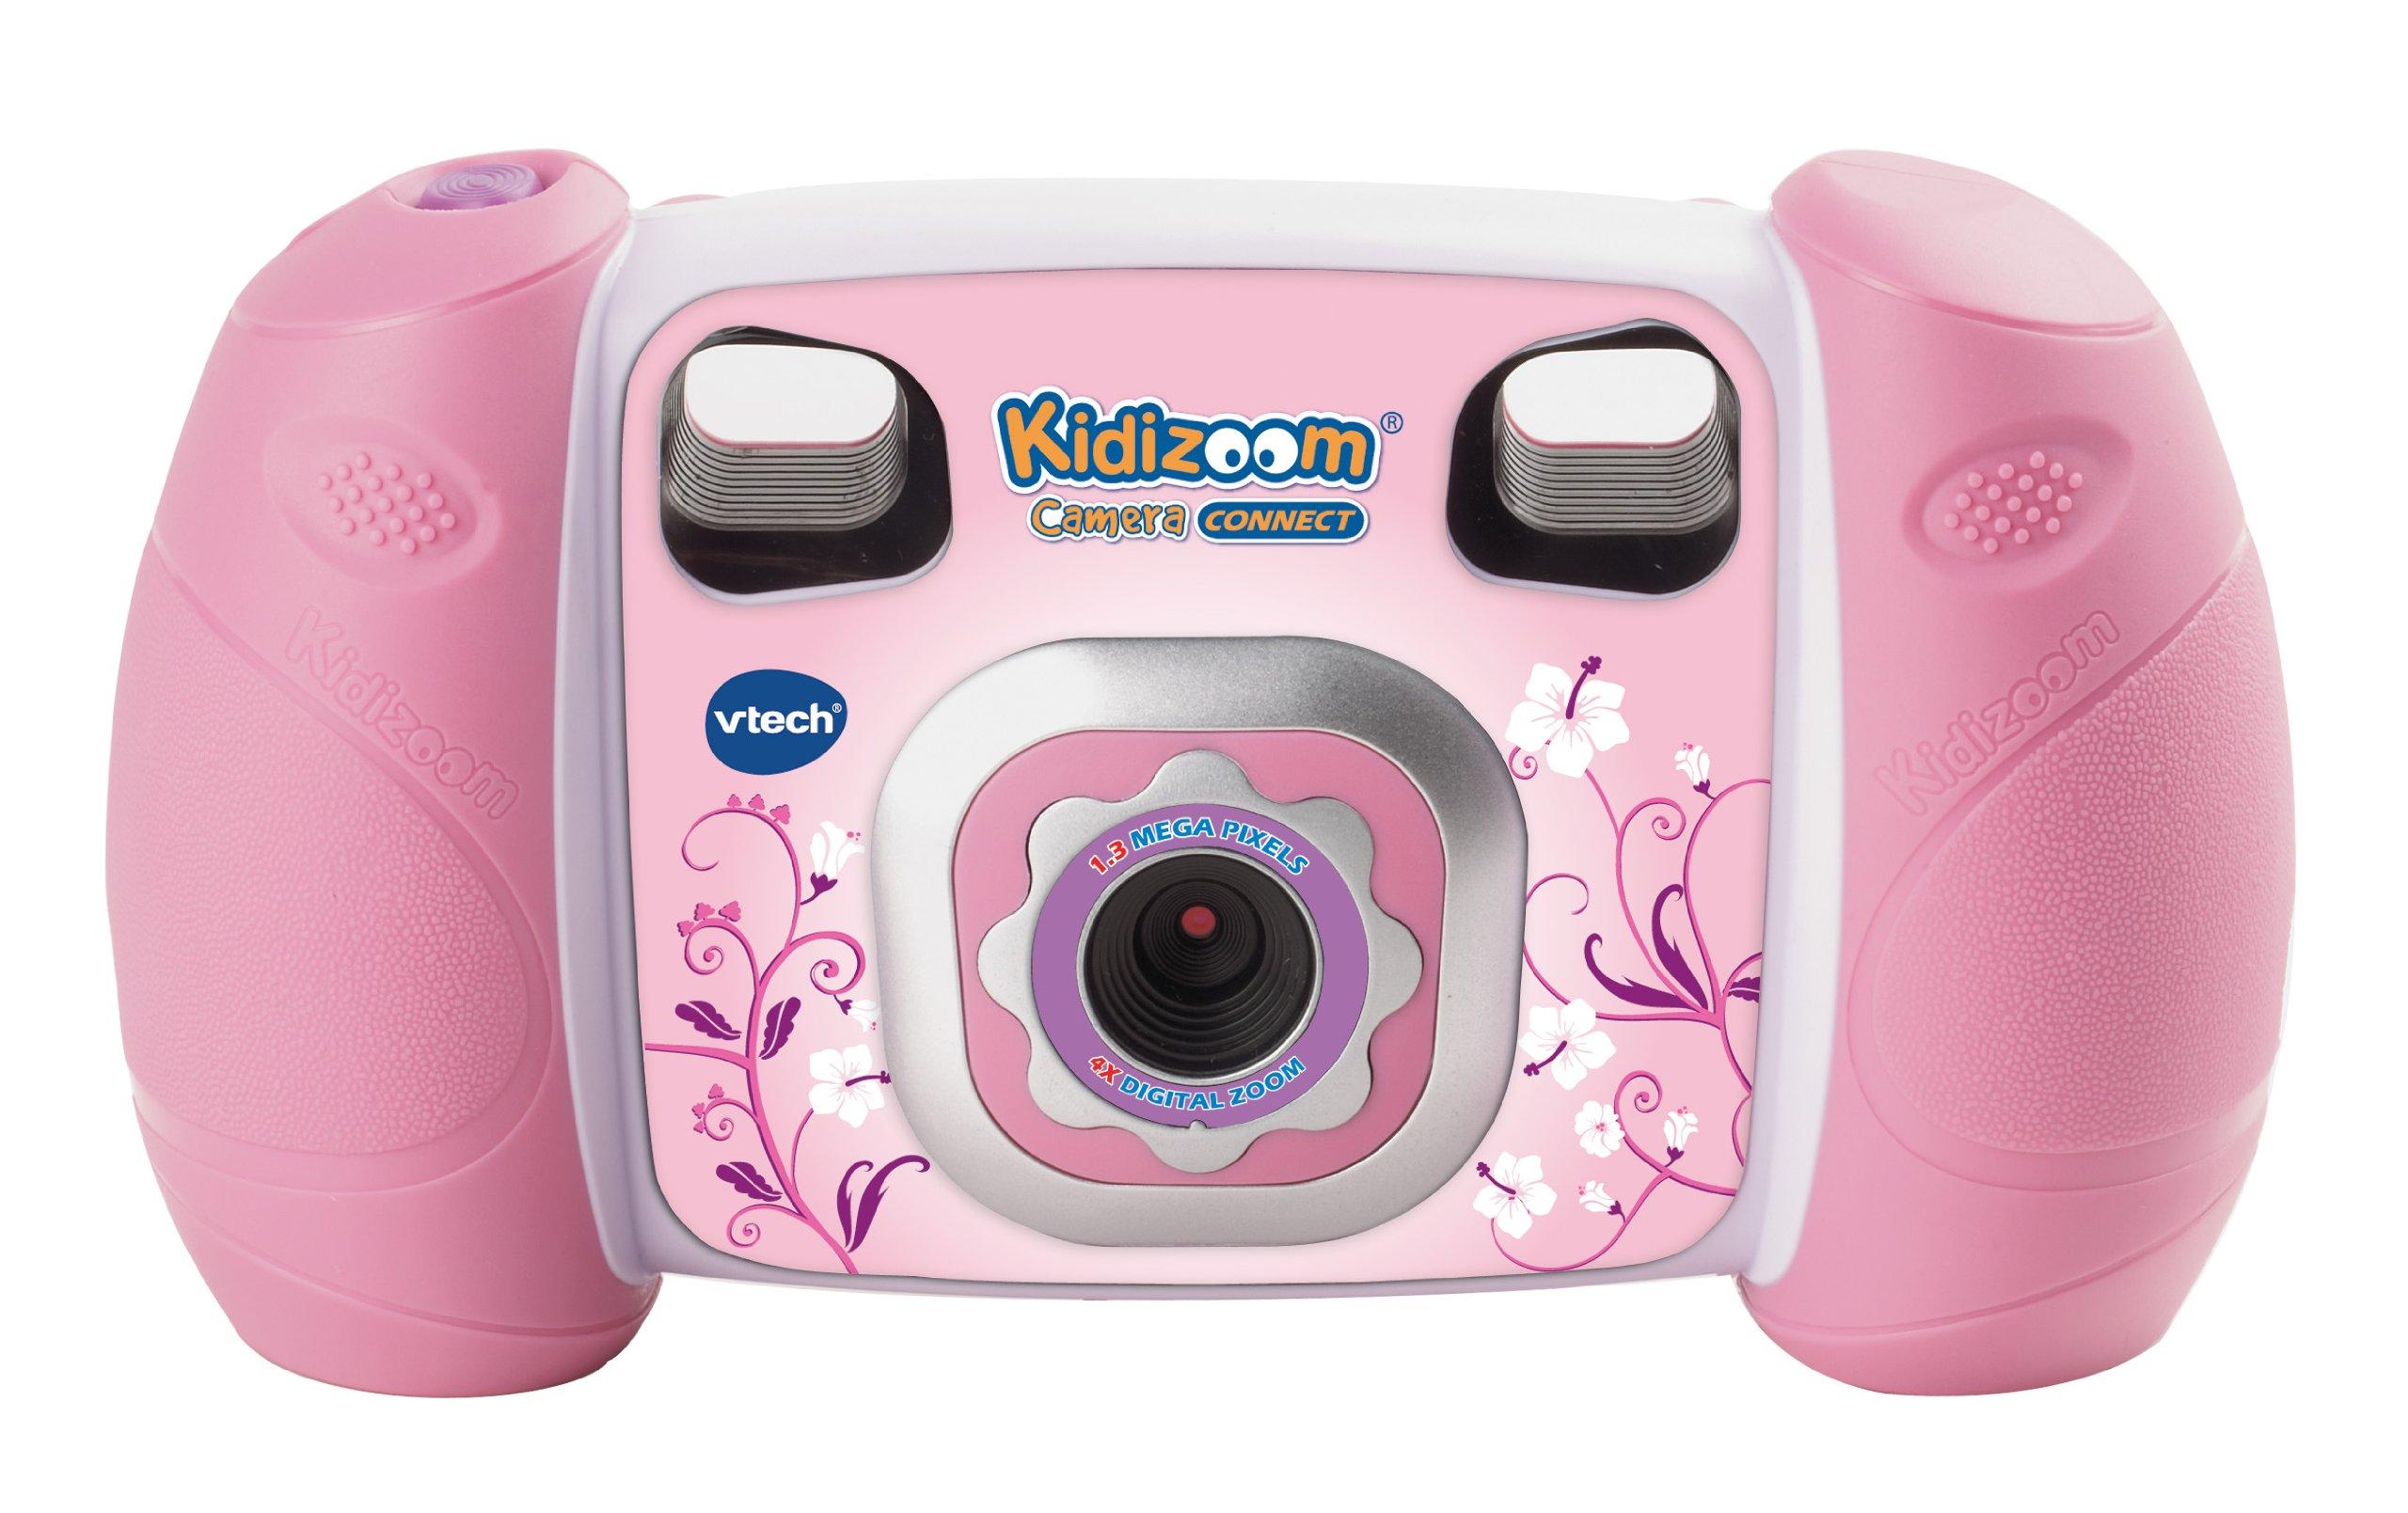 VTech Kidizoom Camera Connect, Pink by VTech (Image #1)